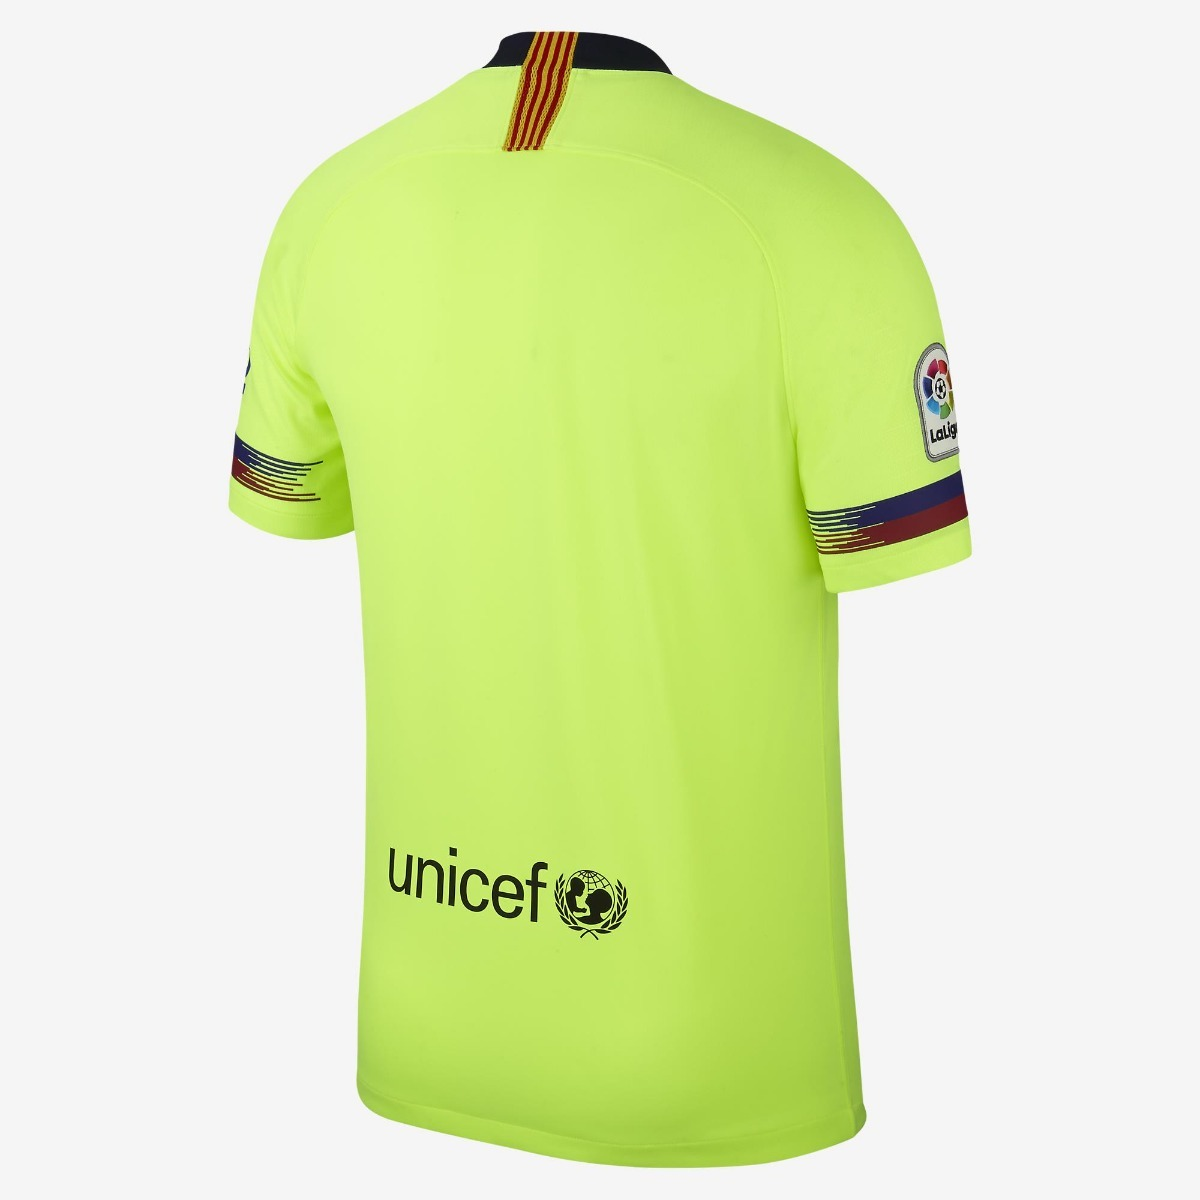 camisa 2 barcelona 18 19 torcedor nike. Carregando zoom. 2259bfbf457ae